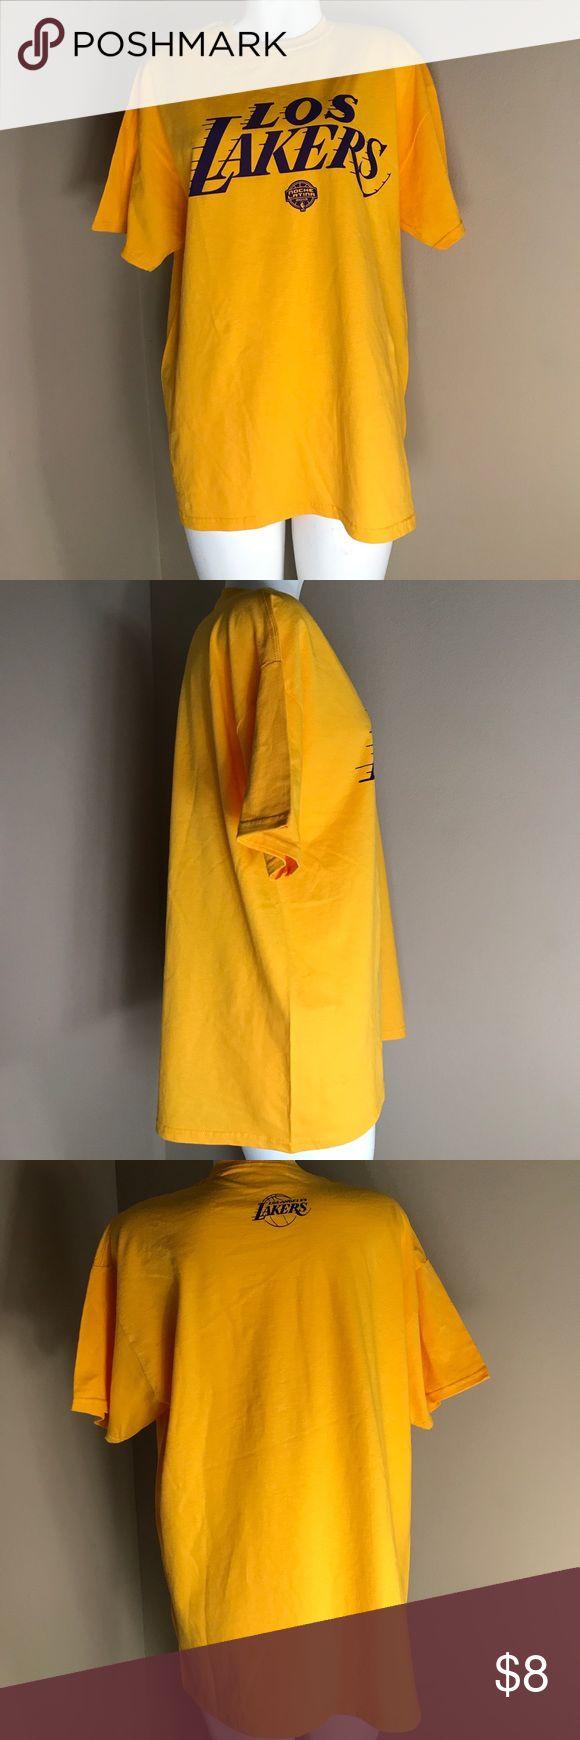 "NBA Los Angeles Lakers Los Lakers T-Shirt NBA Los Angeles Lakers Los Lakers T-Shirt in Gold and Purple Length 32"" Tops Tees - Short Sleeve"